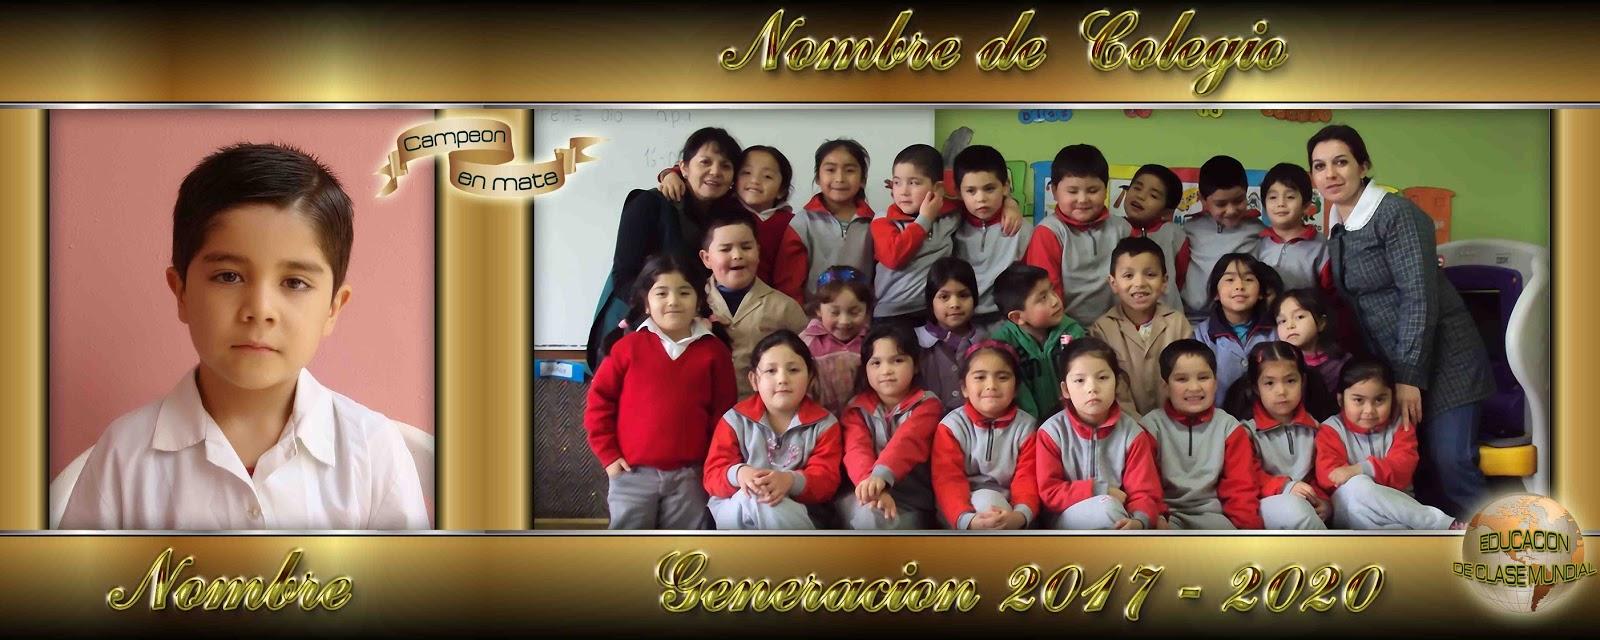 Plantilla Psd Para Foto Grupal Preescolar Gratis | apexwallpapers.com